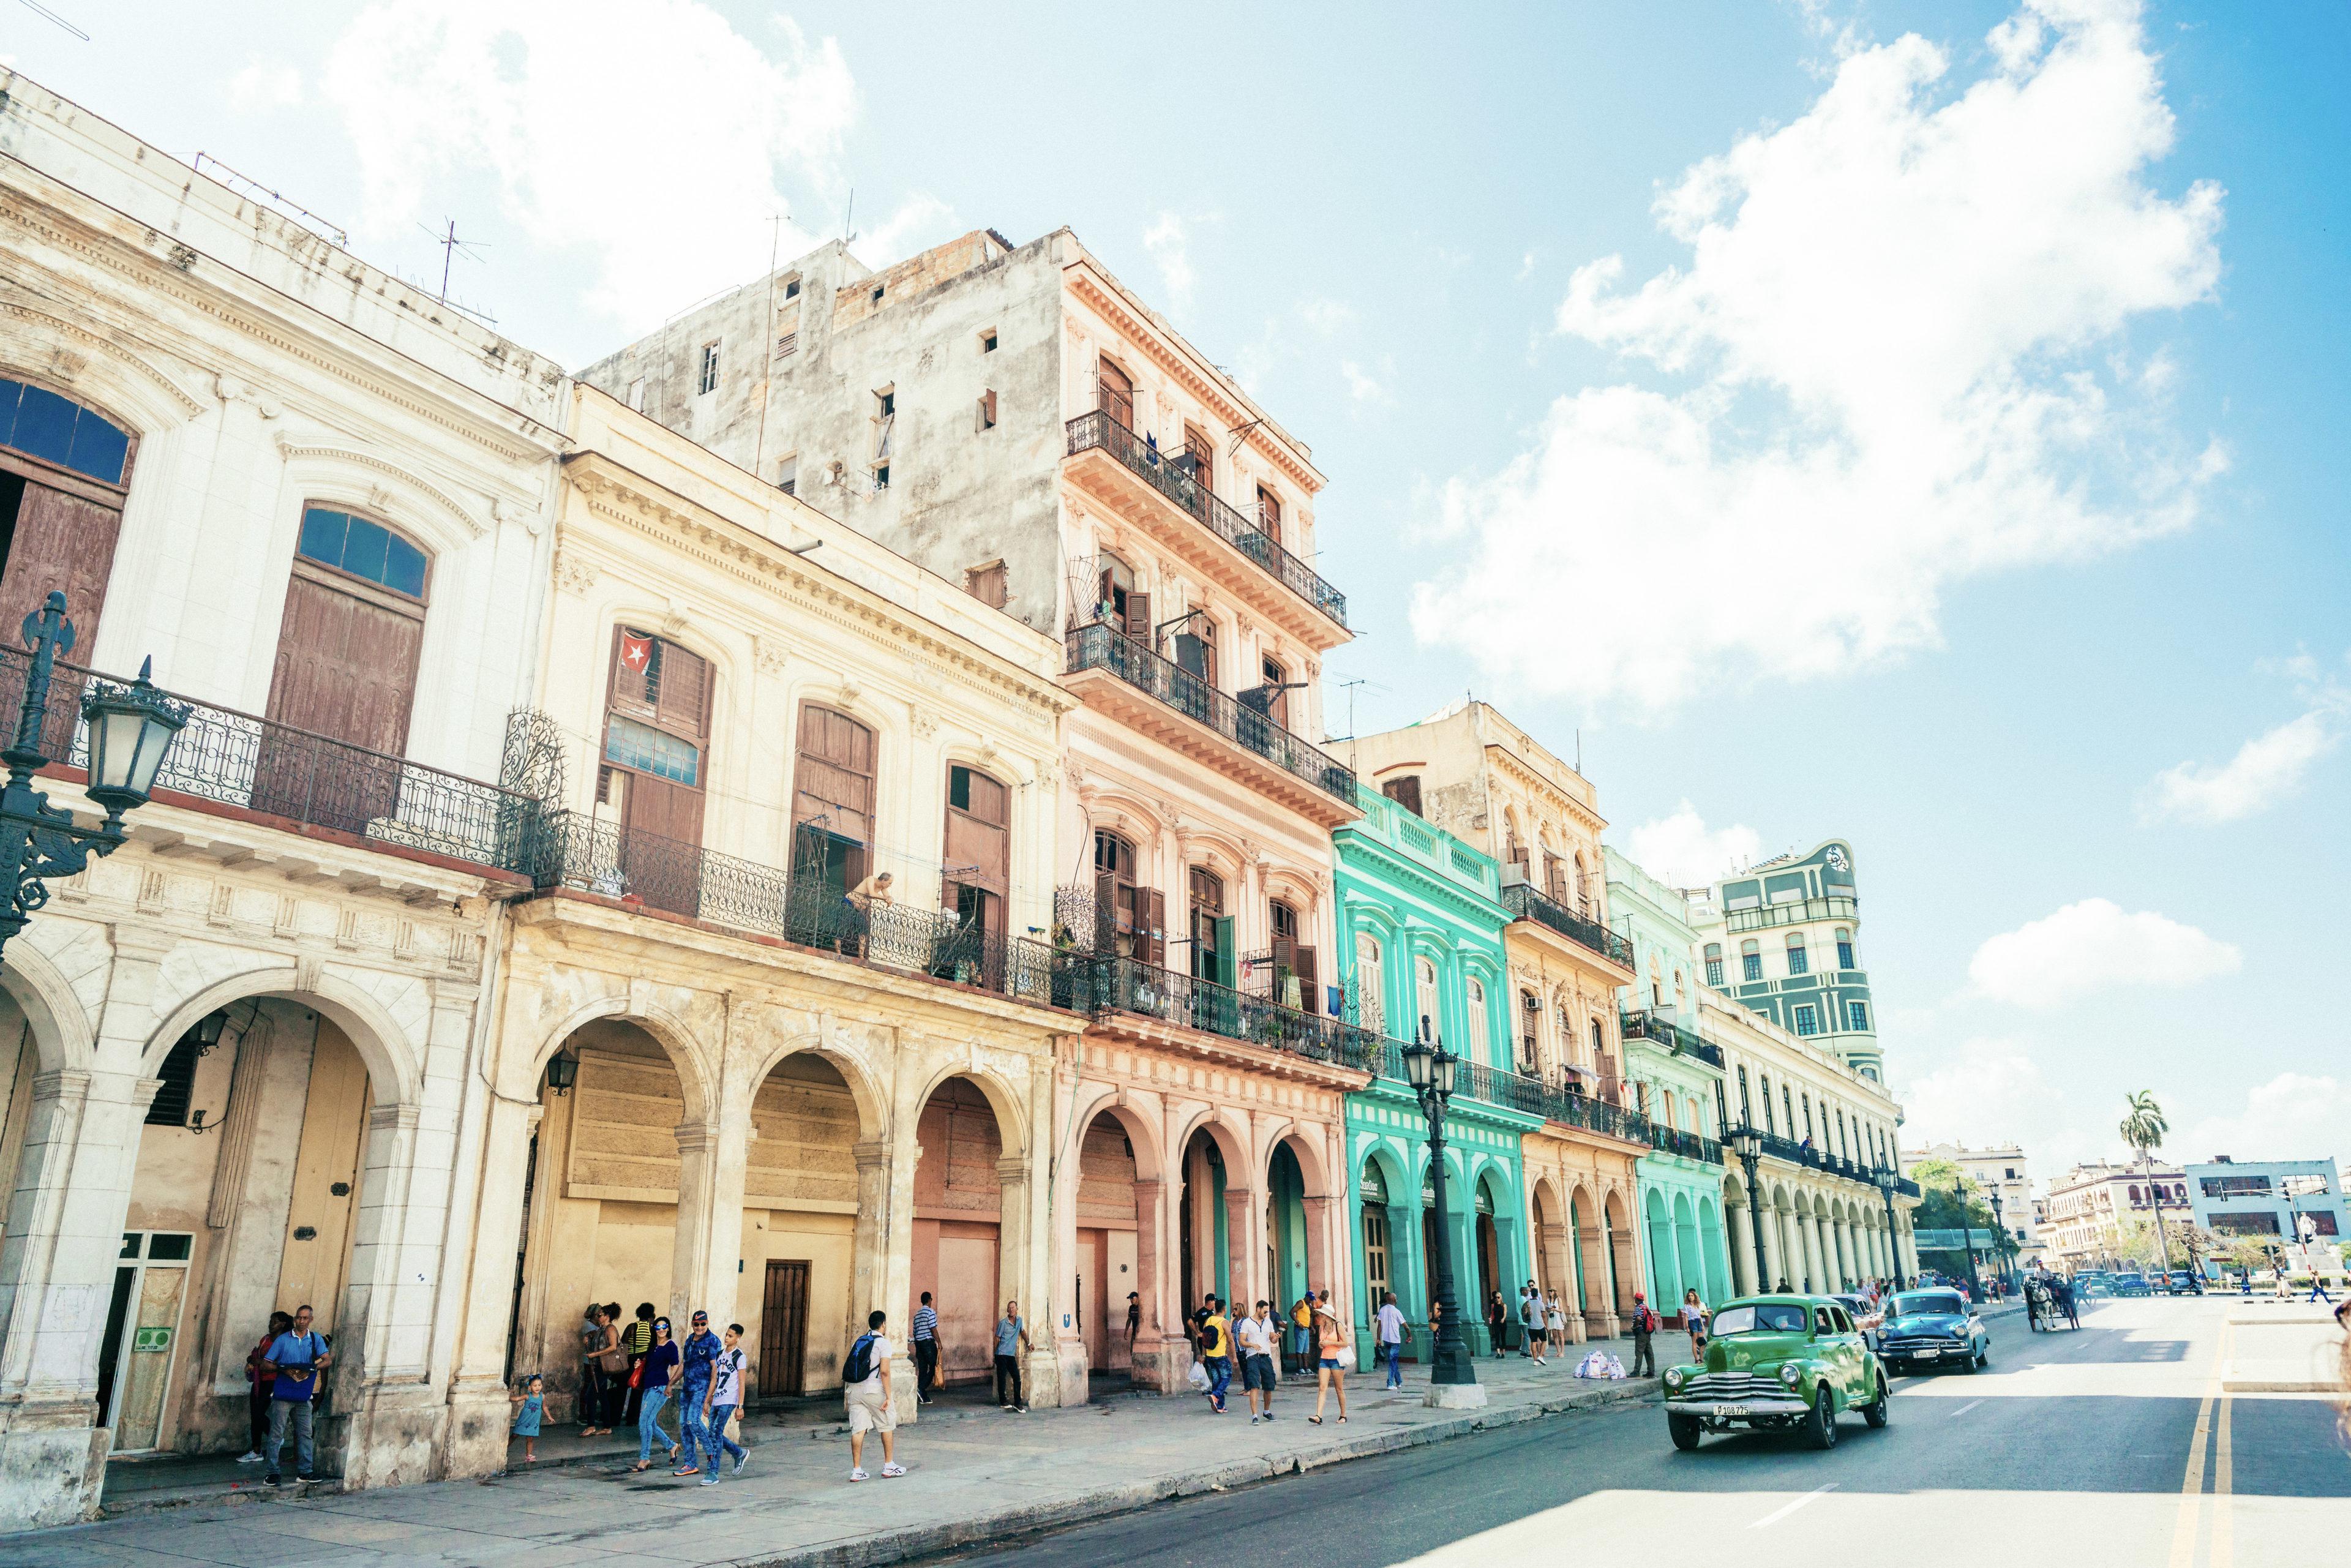 Häuserfront in Habana Vieja